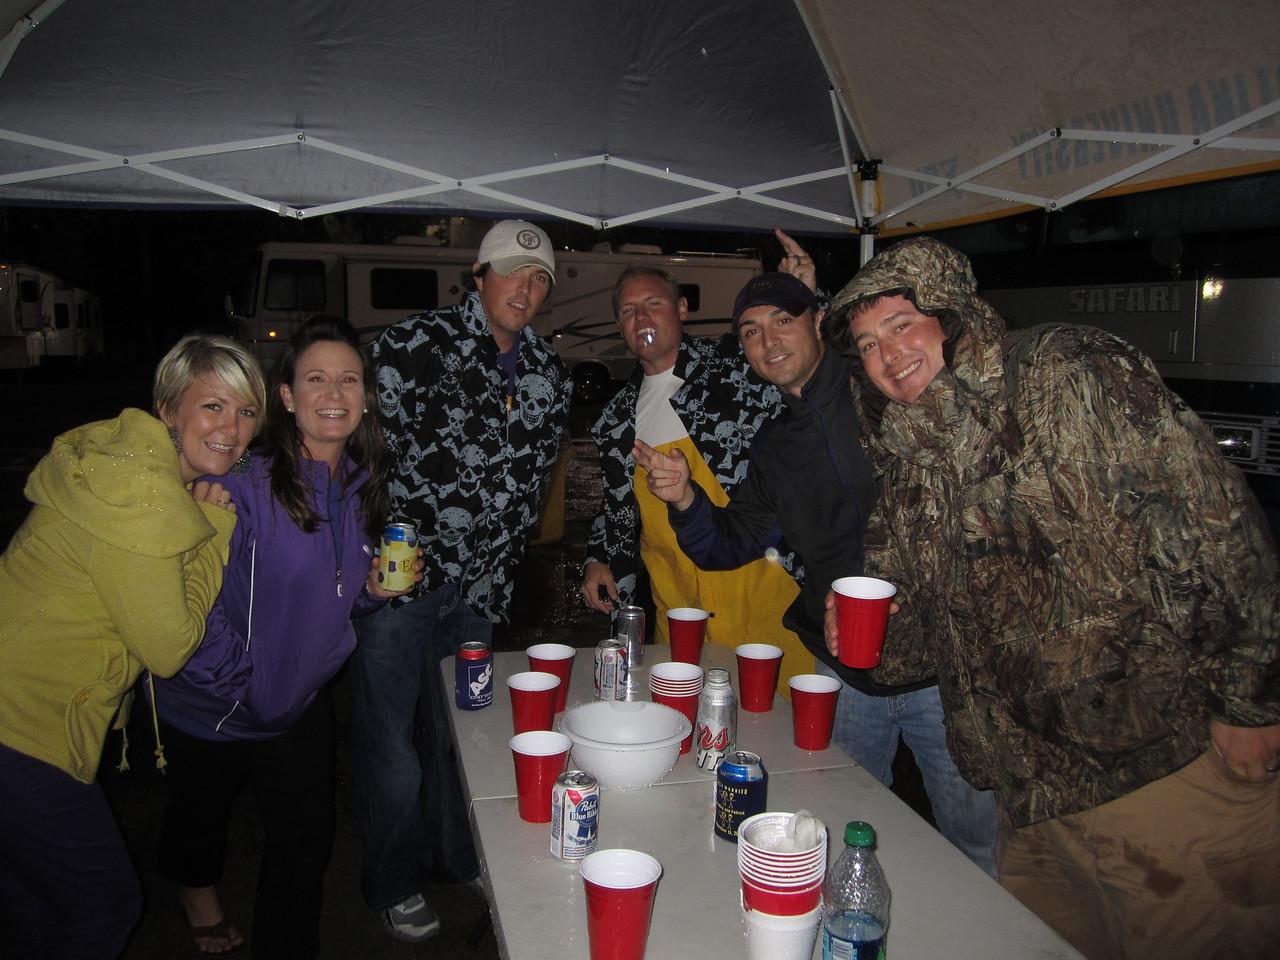 9/29 UTEP Postgame flip cup. Natalie, Lindsay, Aaron, JG, Chris, Jason